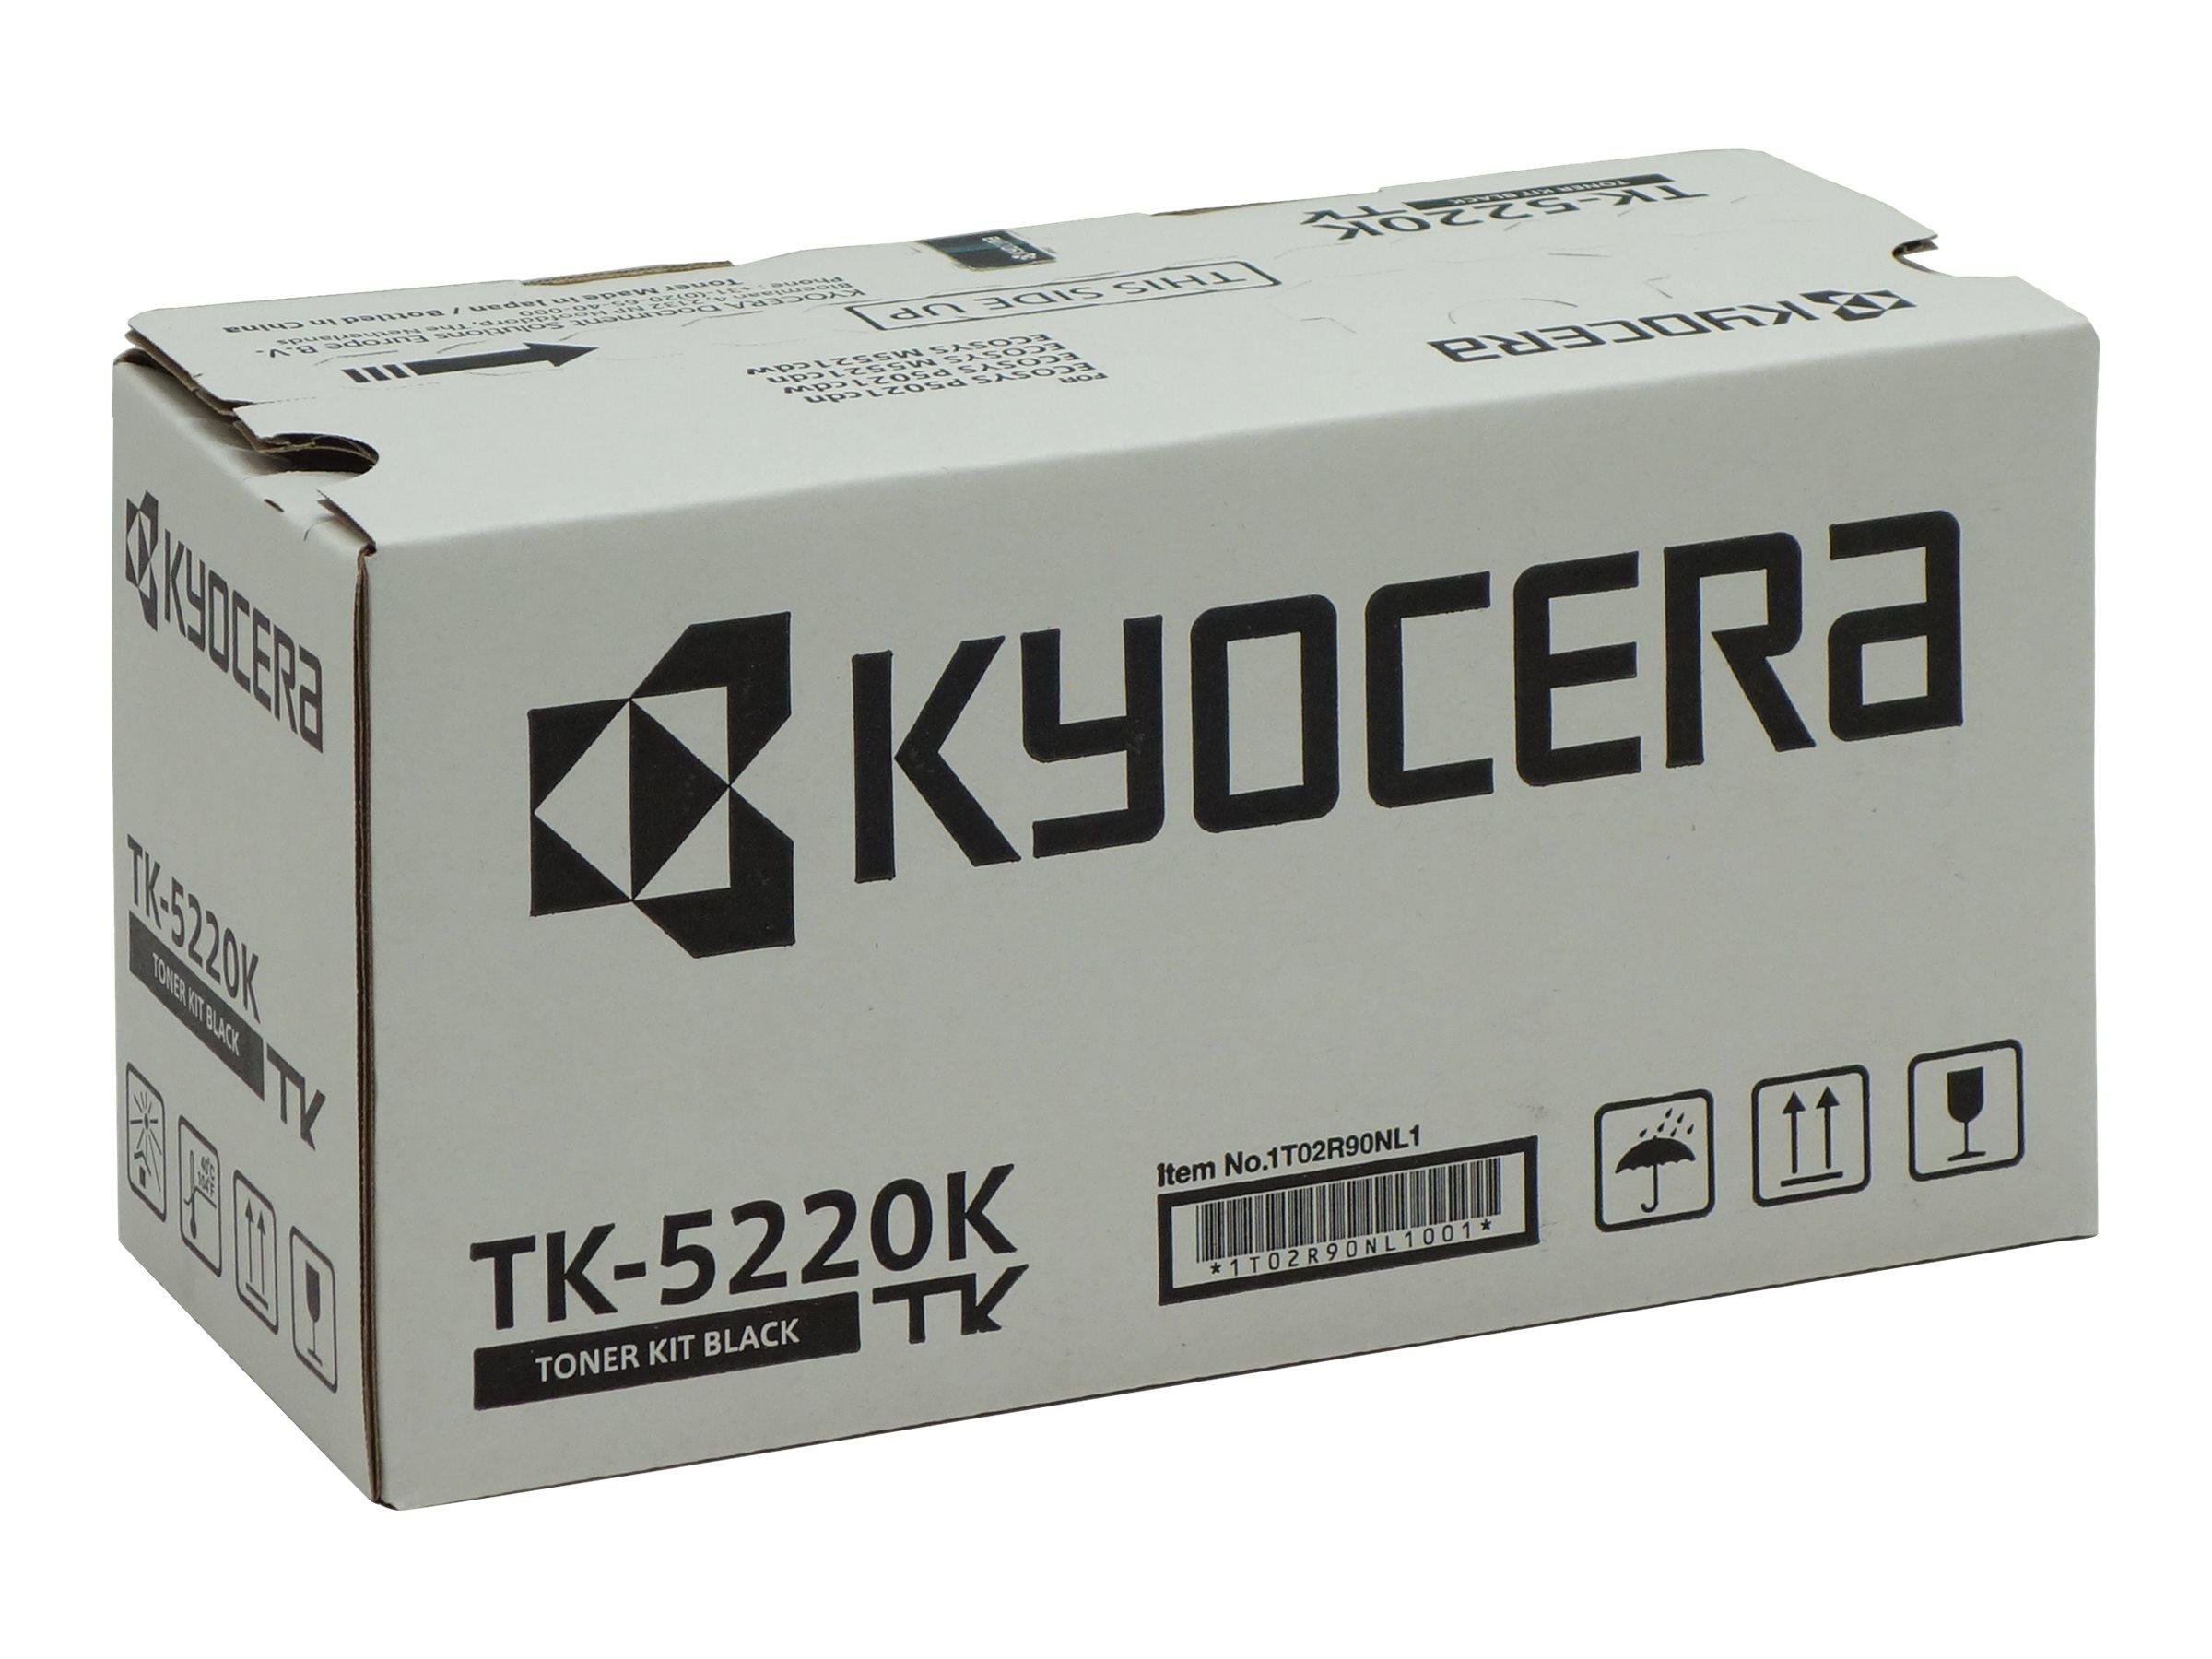 Kyocera TK 5220K - Schwarz - Original - Tonerpatrone